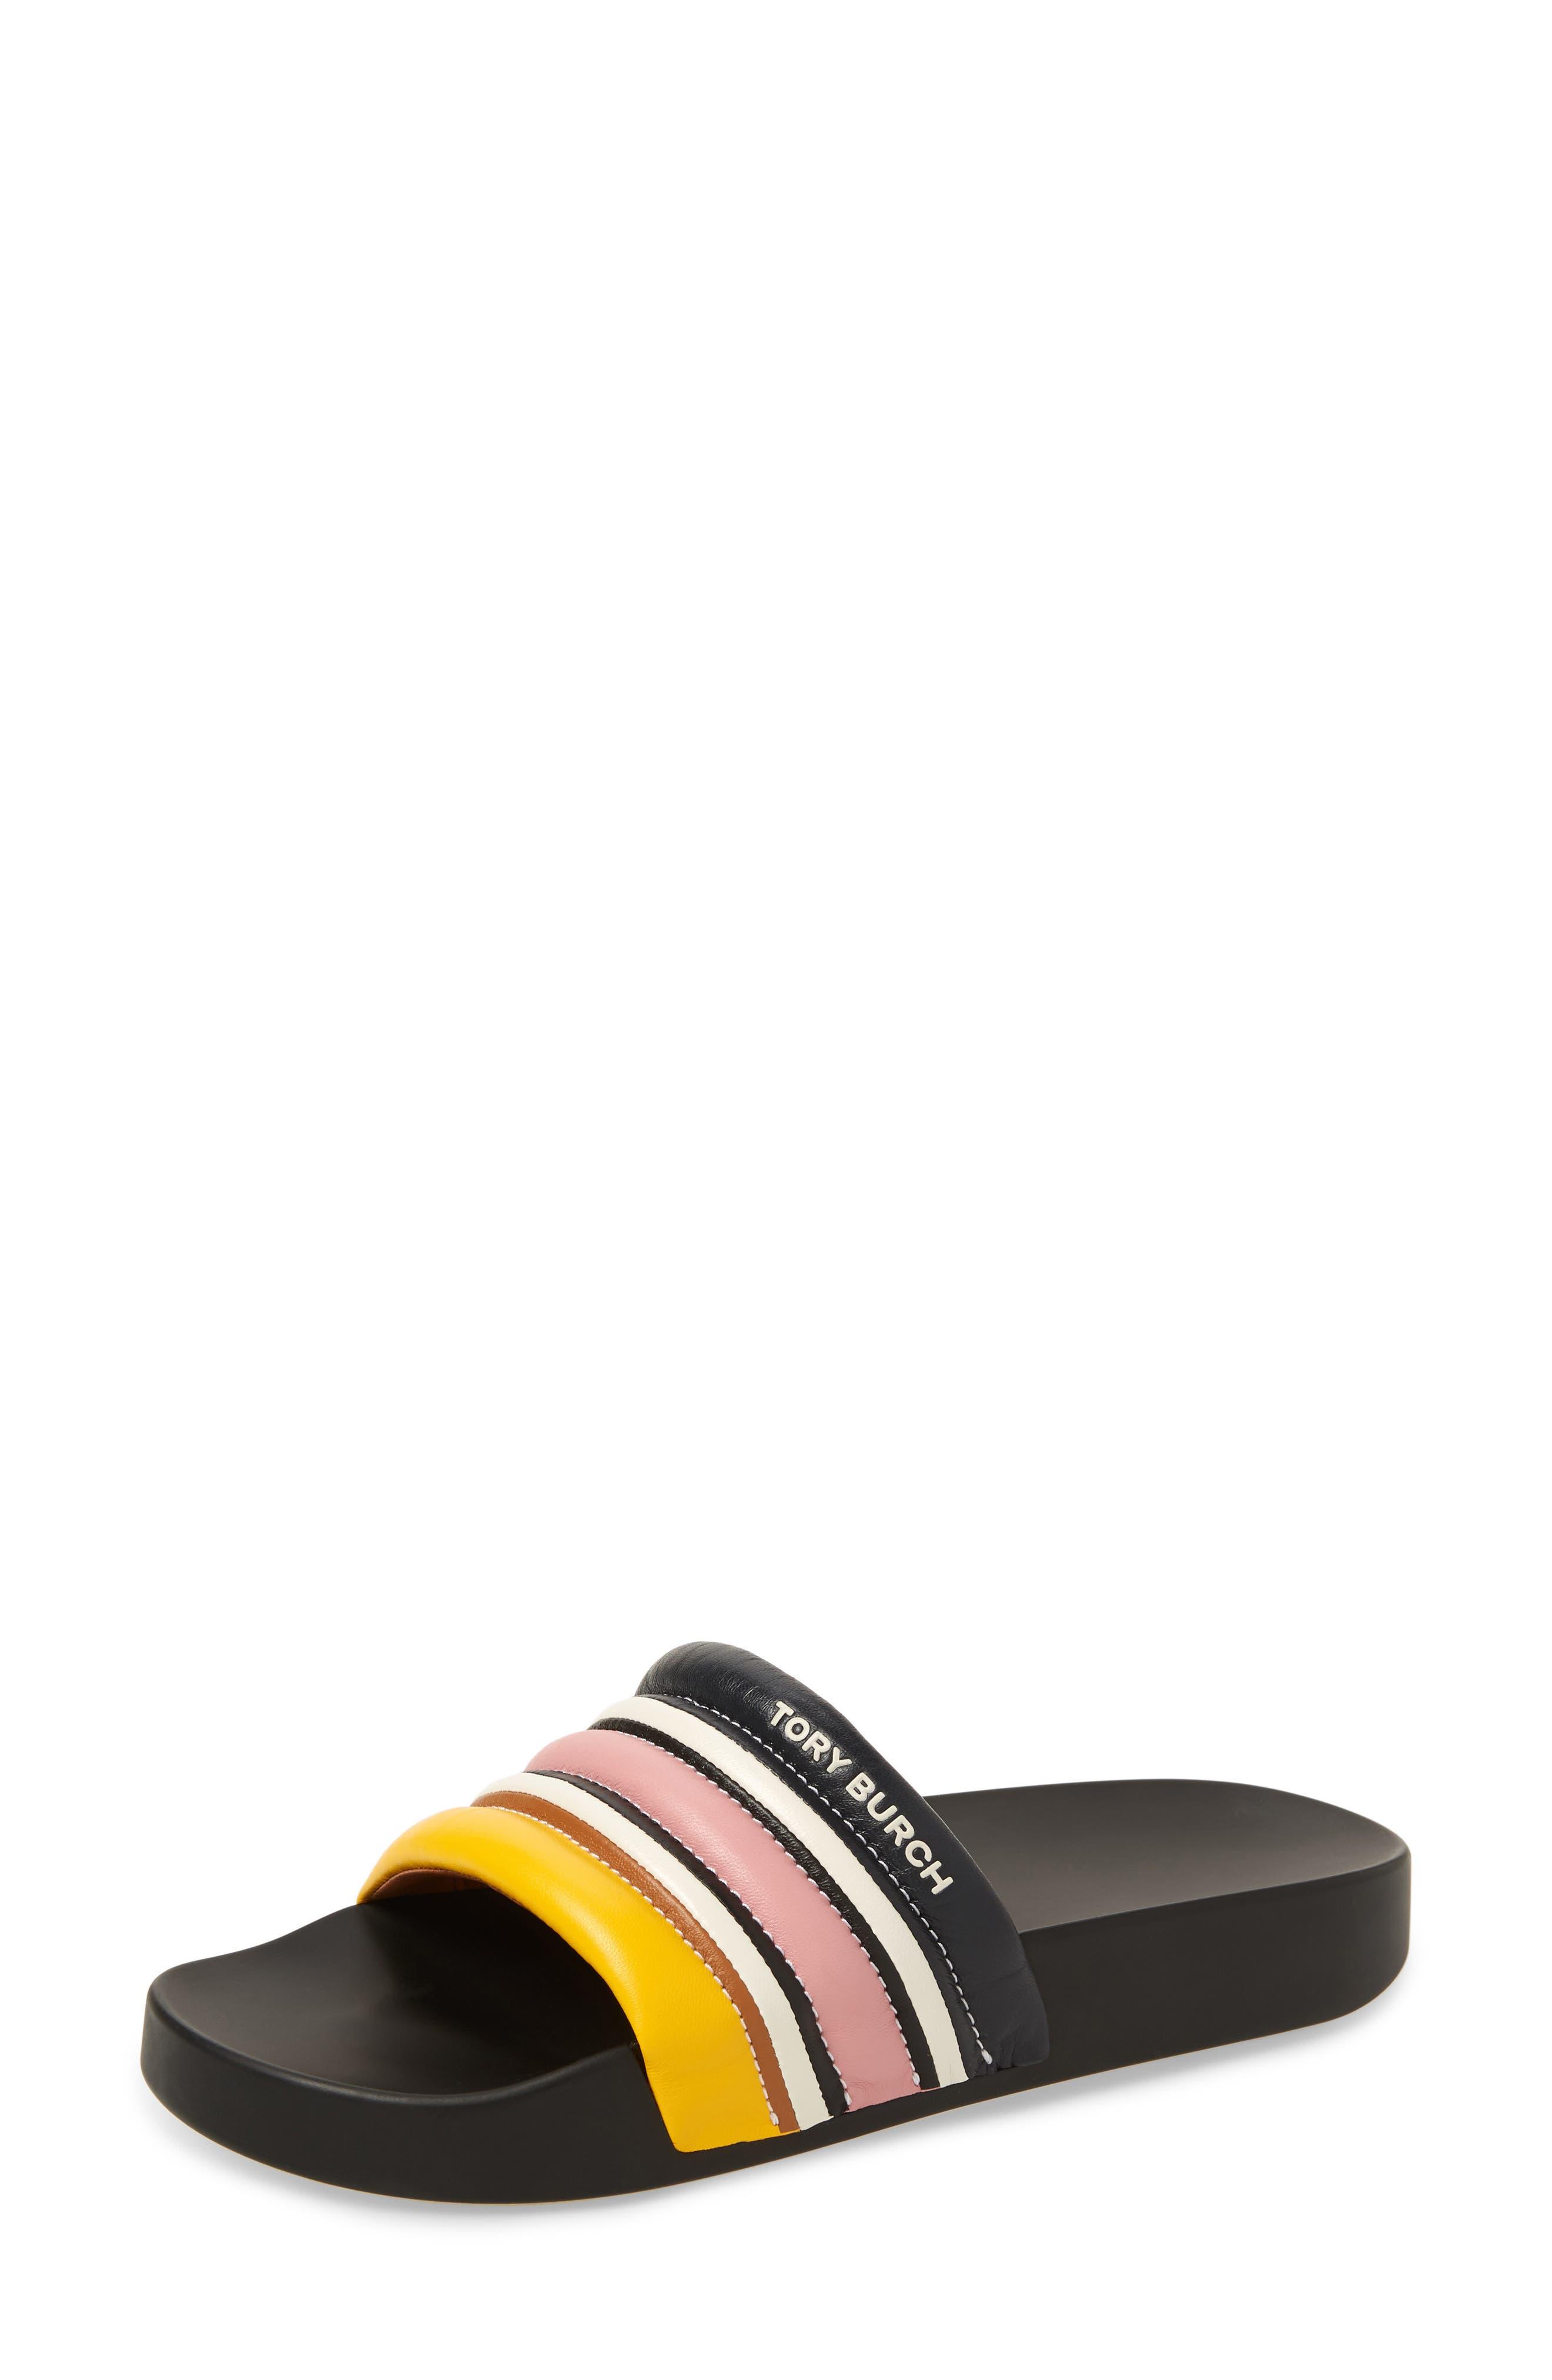 Tory Burch Colorblock Stripe Slide Sandal, Yellow